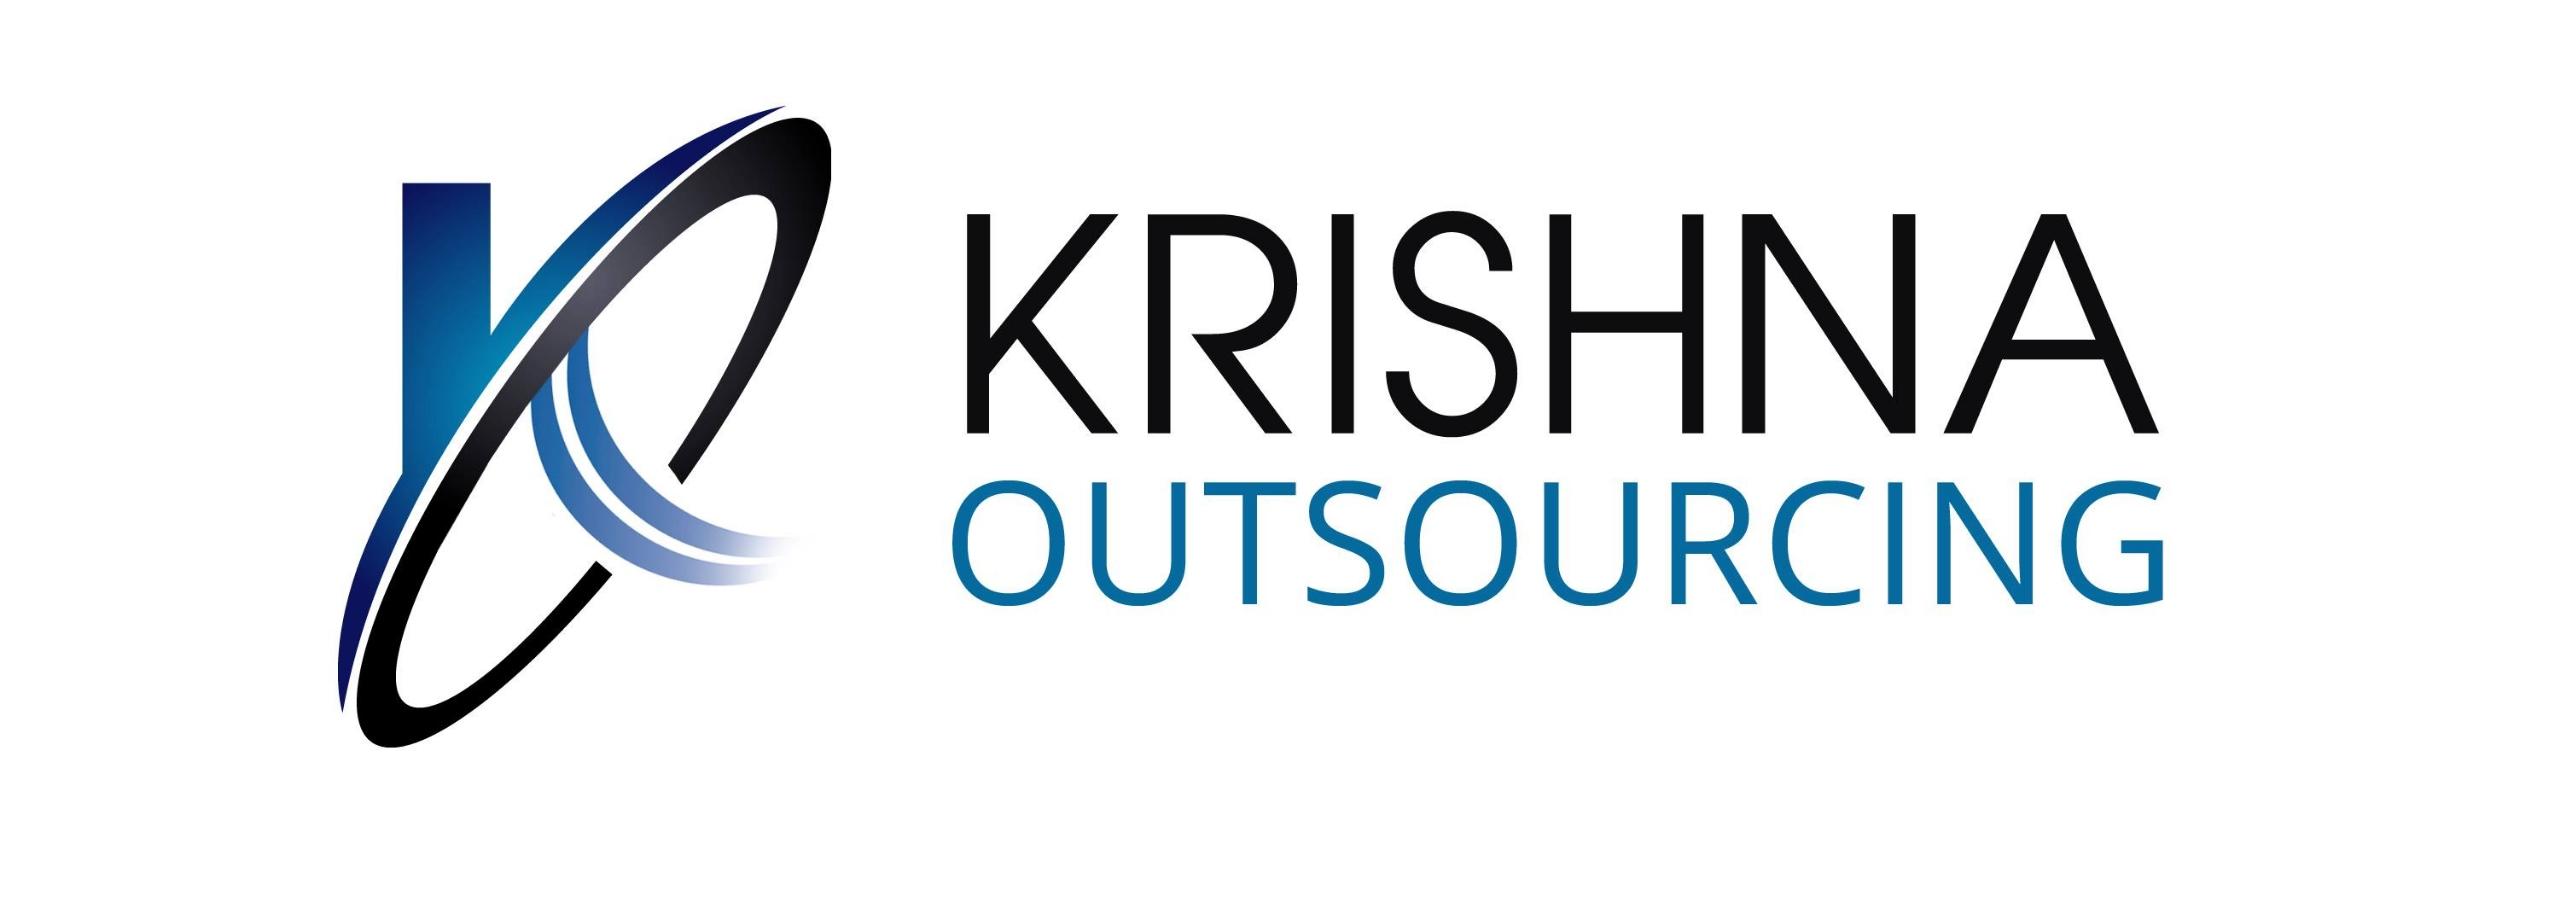 Krishna Outsourcing (@krishnaoutsourcing) Cover Image